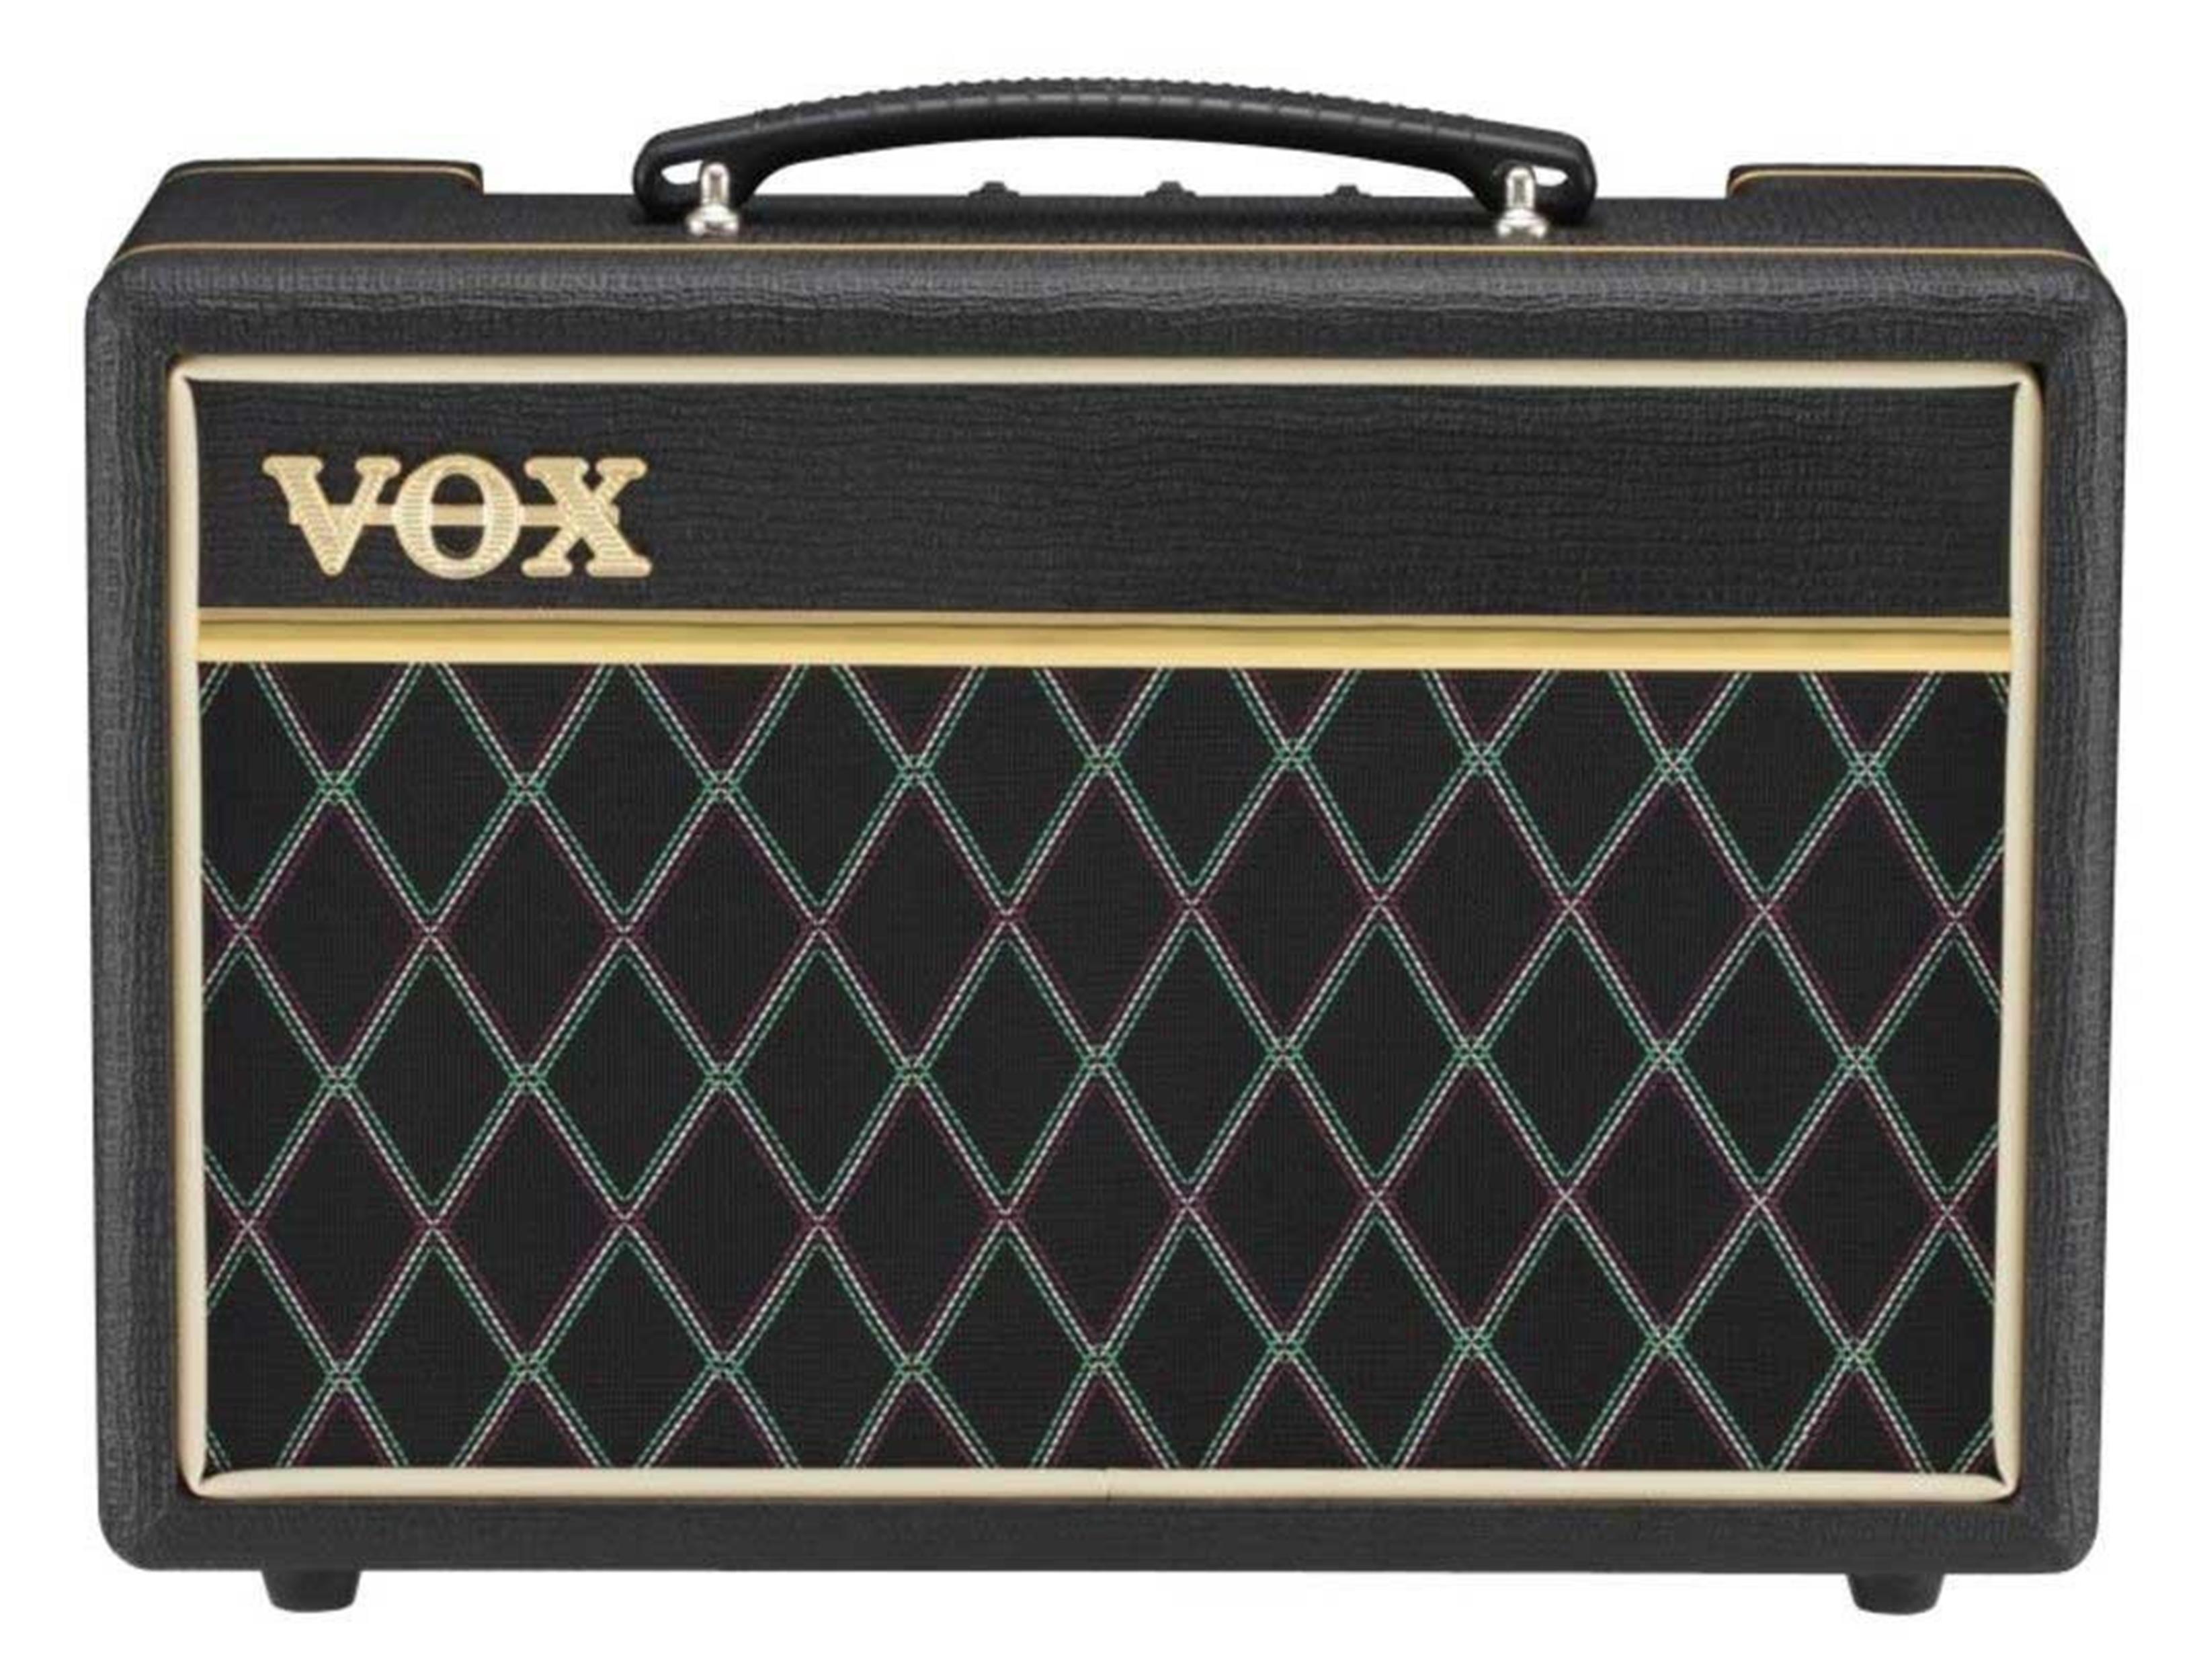 VOX PATHFINDER 10 B BASS